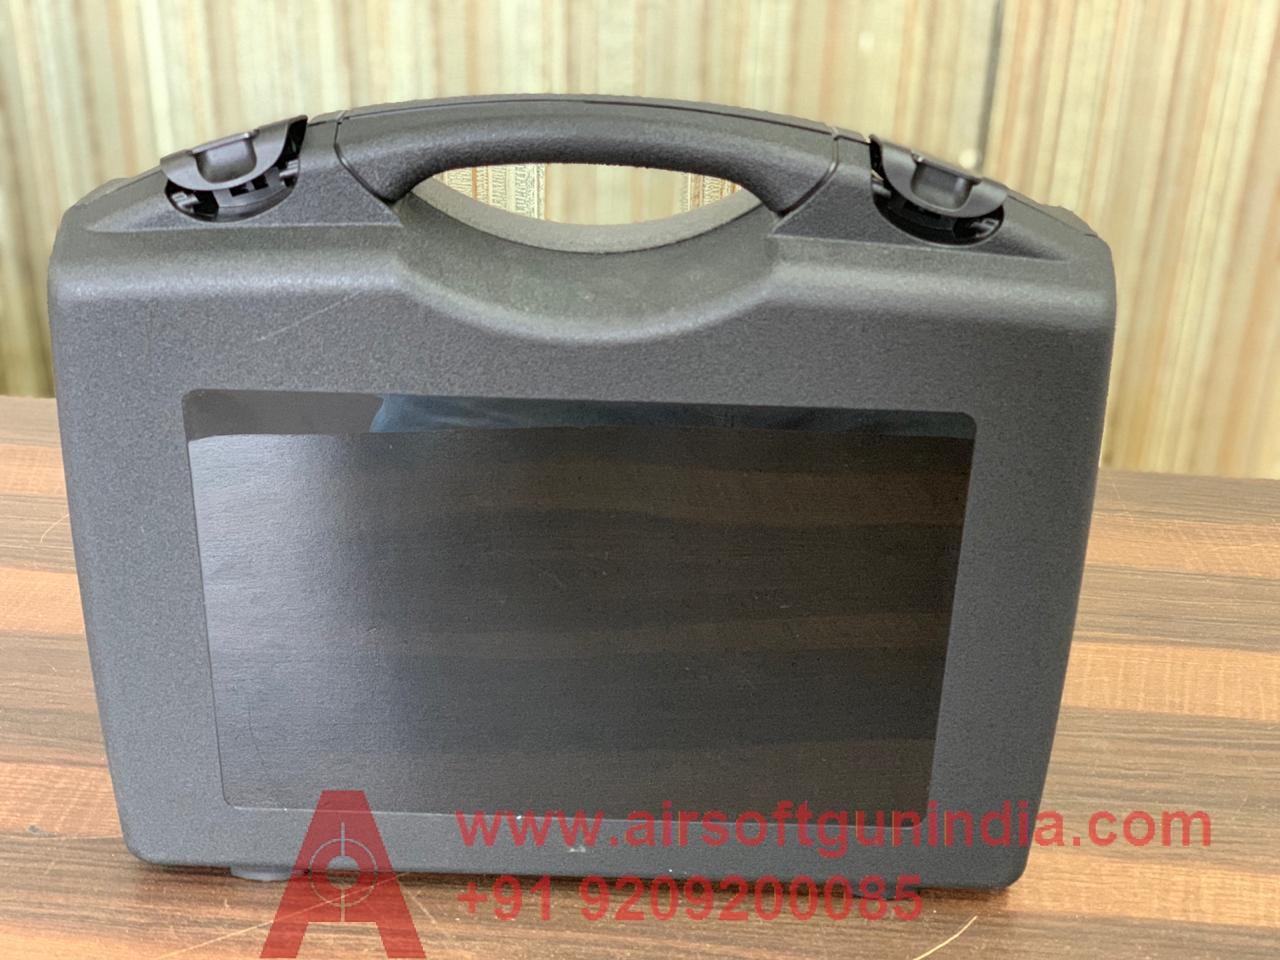 PISTOL /REVOLVER PROTECTIVE GUN CASE BOX BY AIRSOFT GUN INDIA